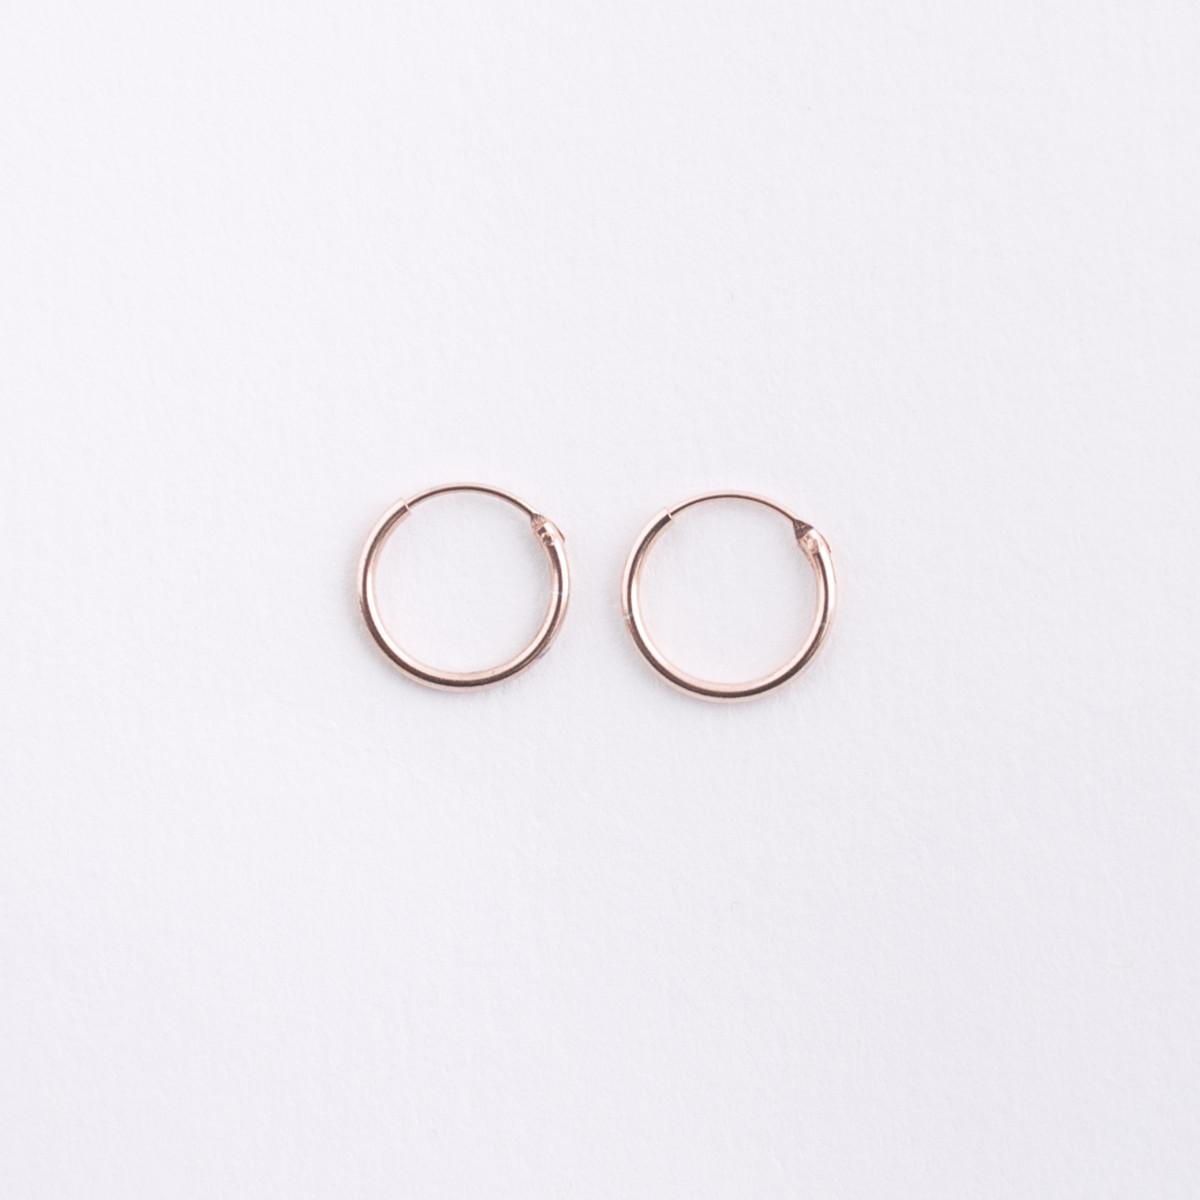 Small Rose Gold Hoop Earrings • HOPSCOTCH • e01c12f74ce5